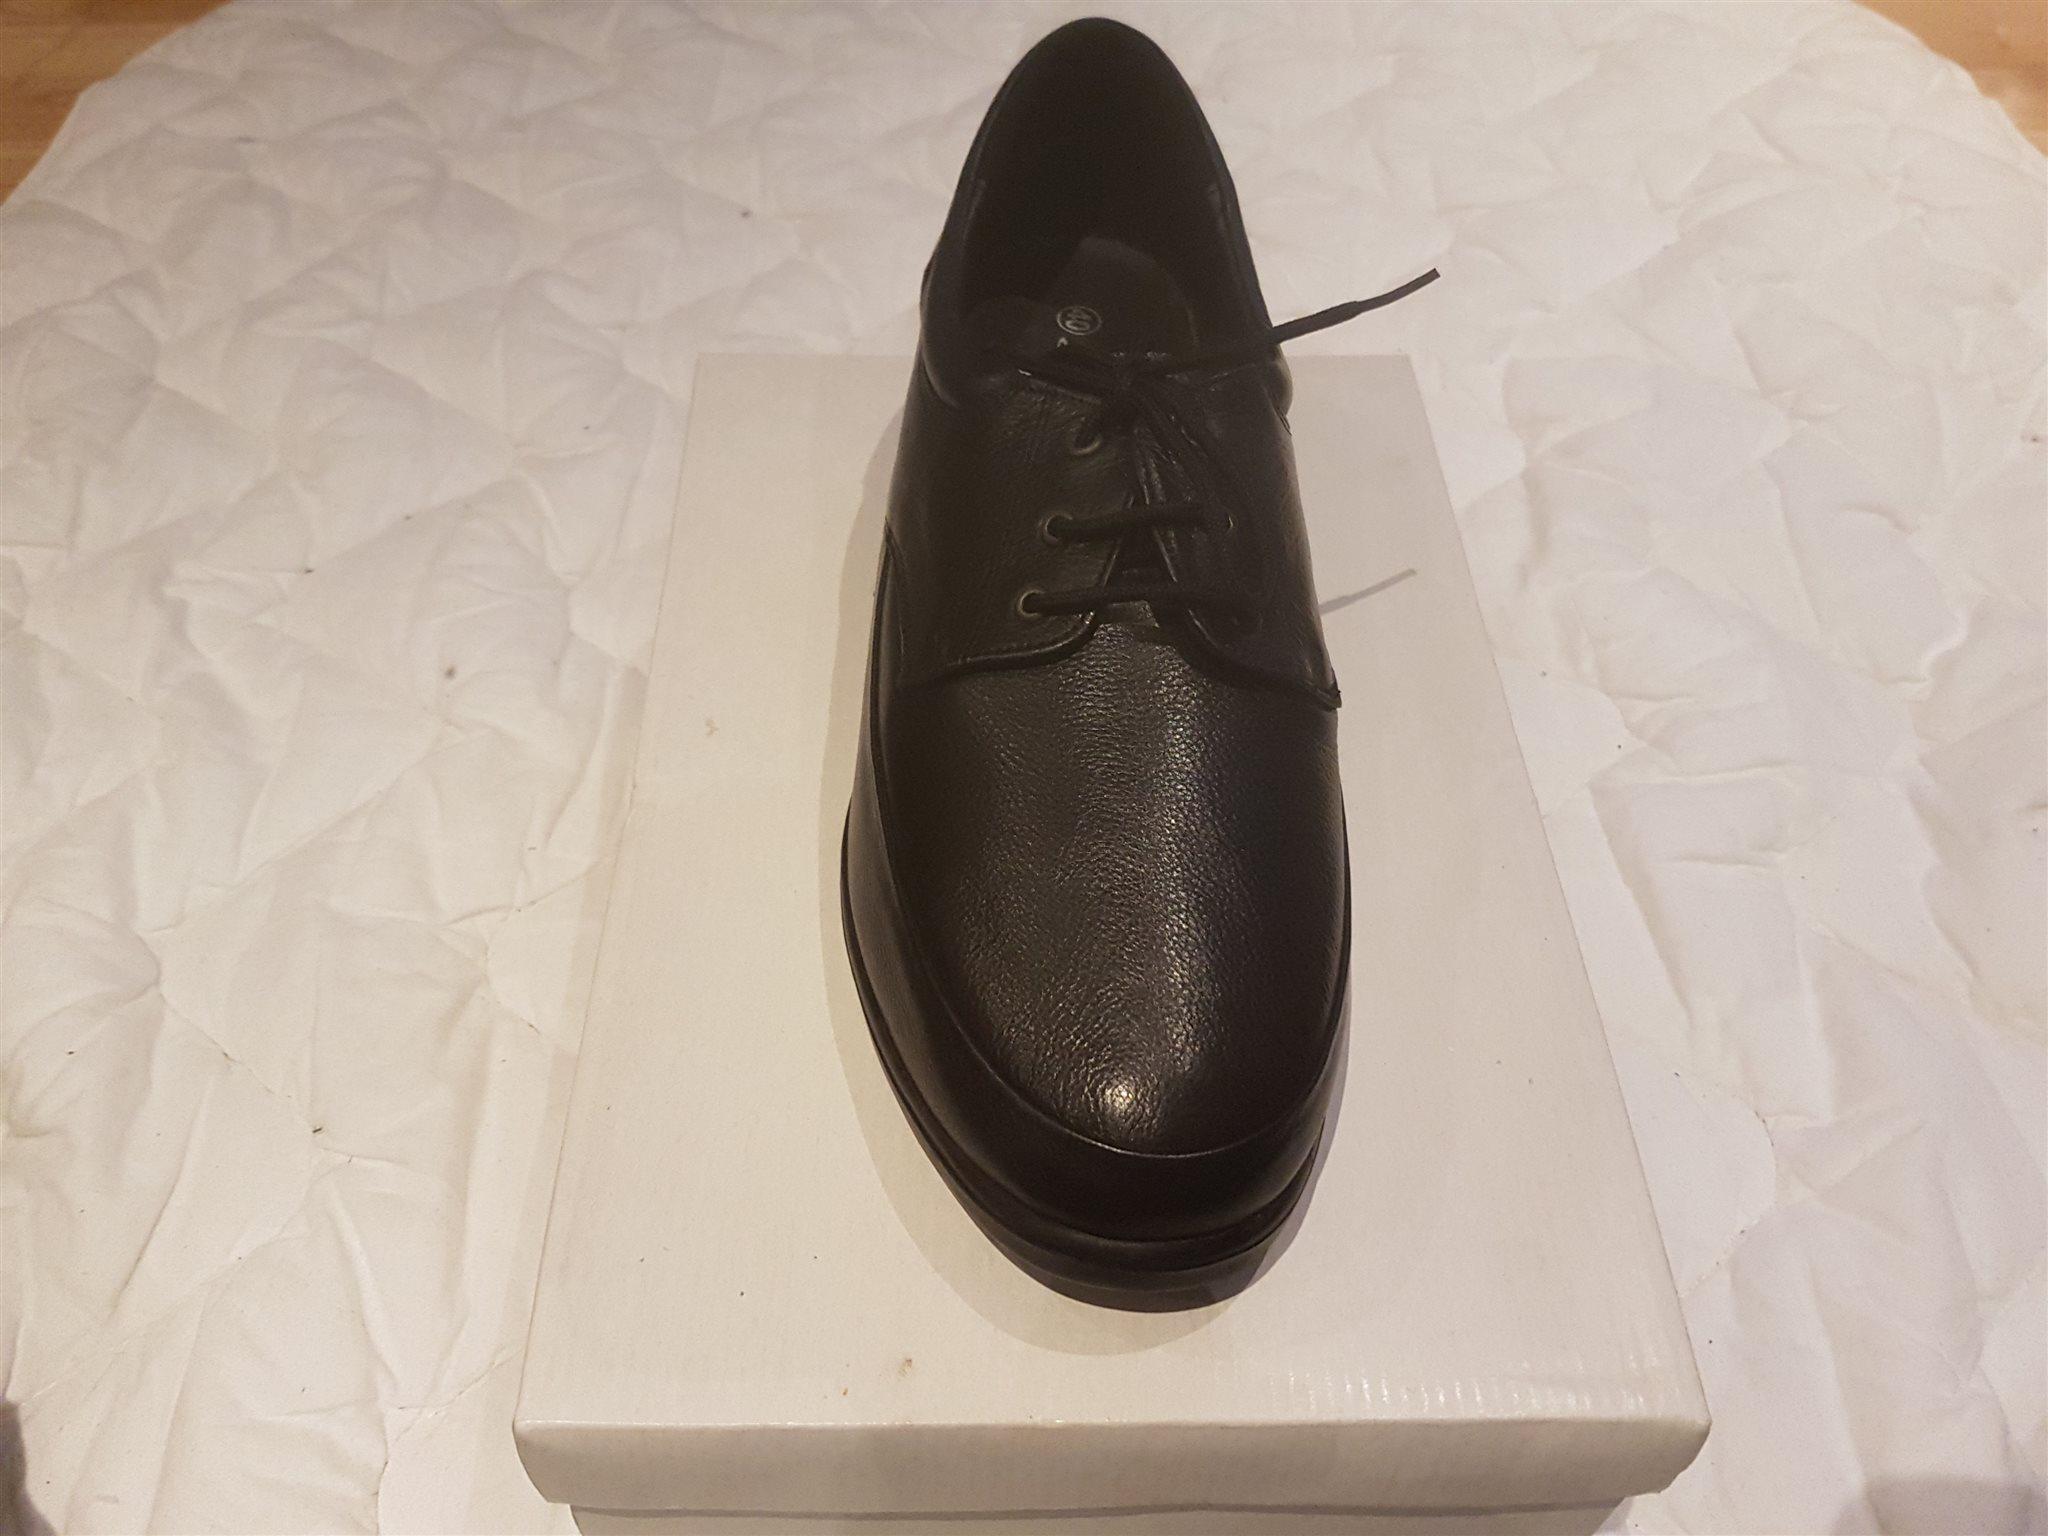 bekväma skor i sverige ab göteborg